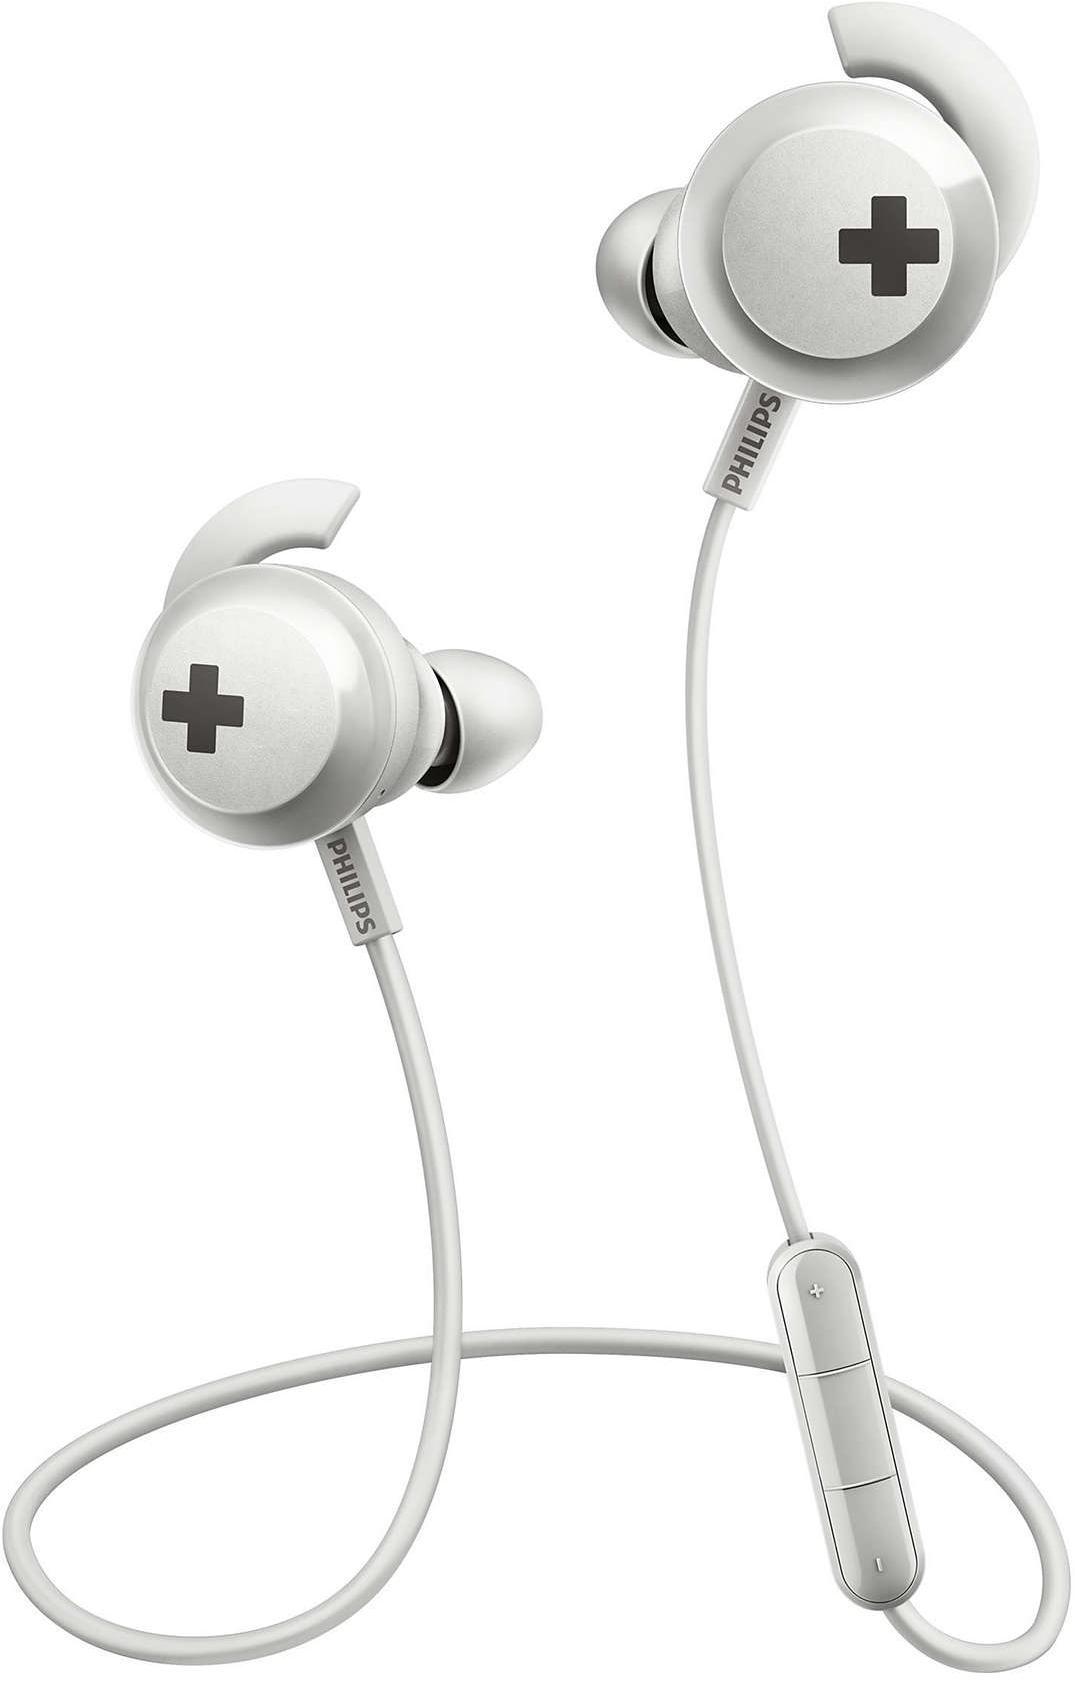 Купить Навушники Philips SHB4305WT/00 White